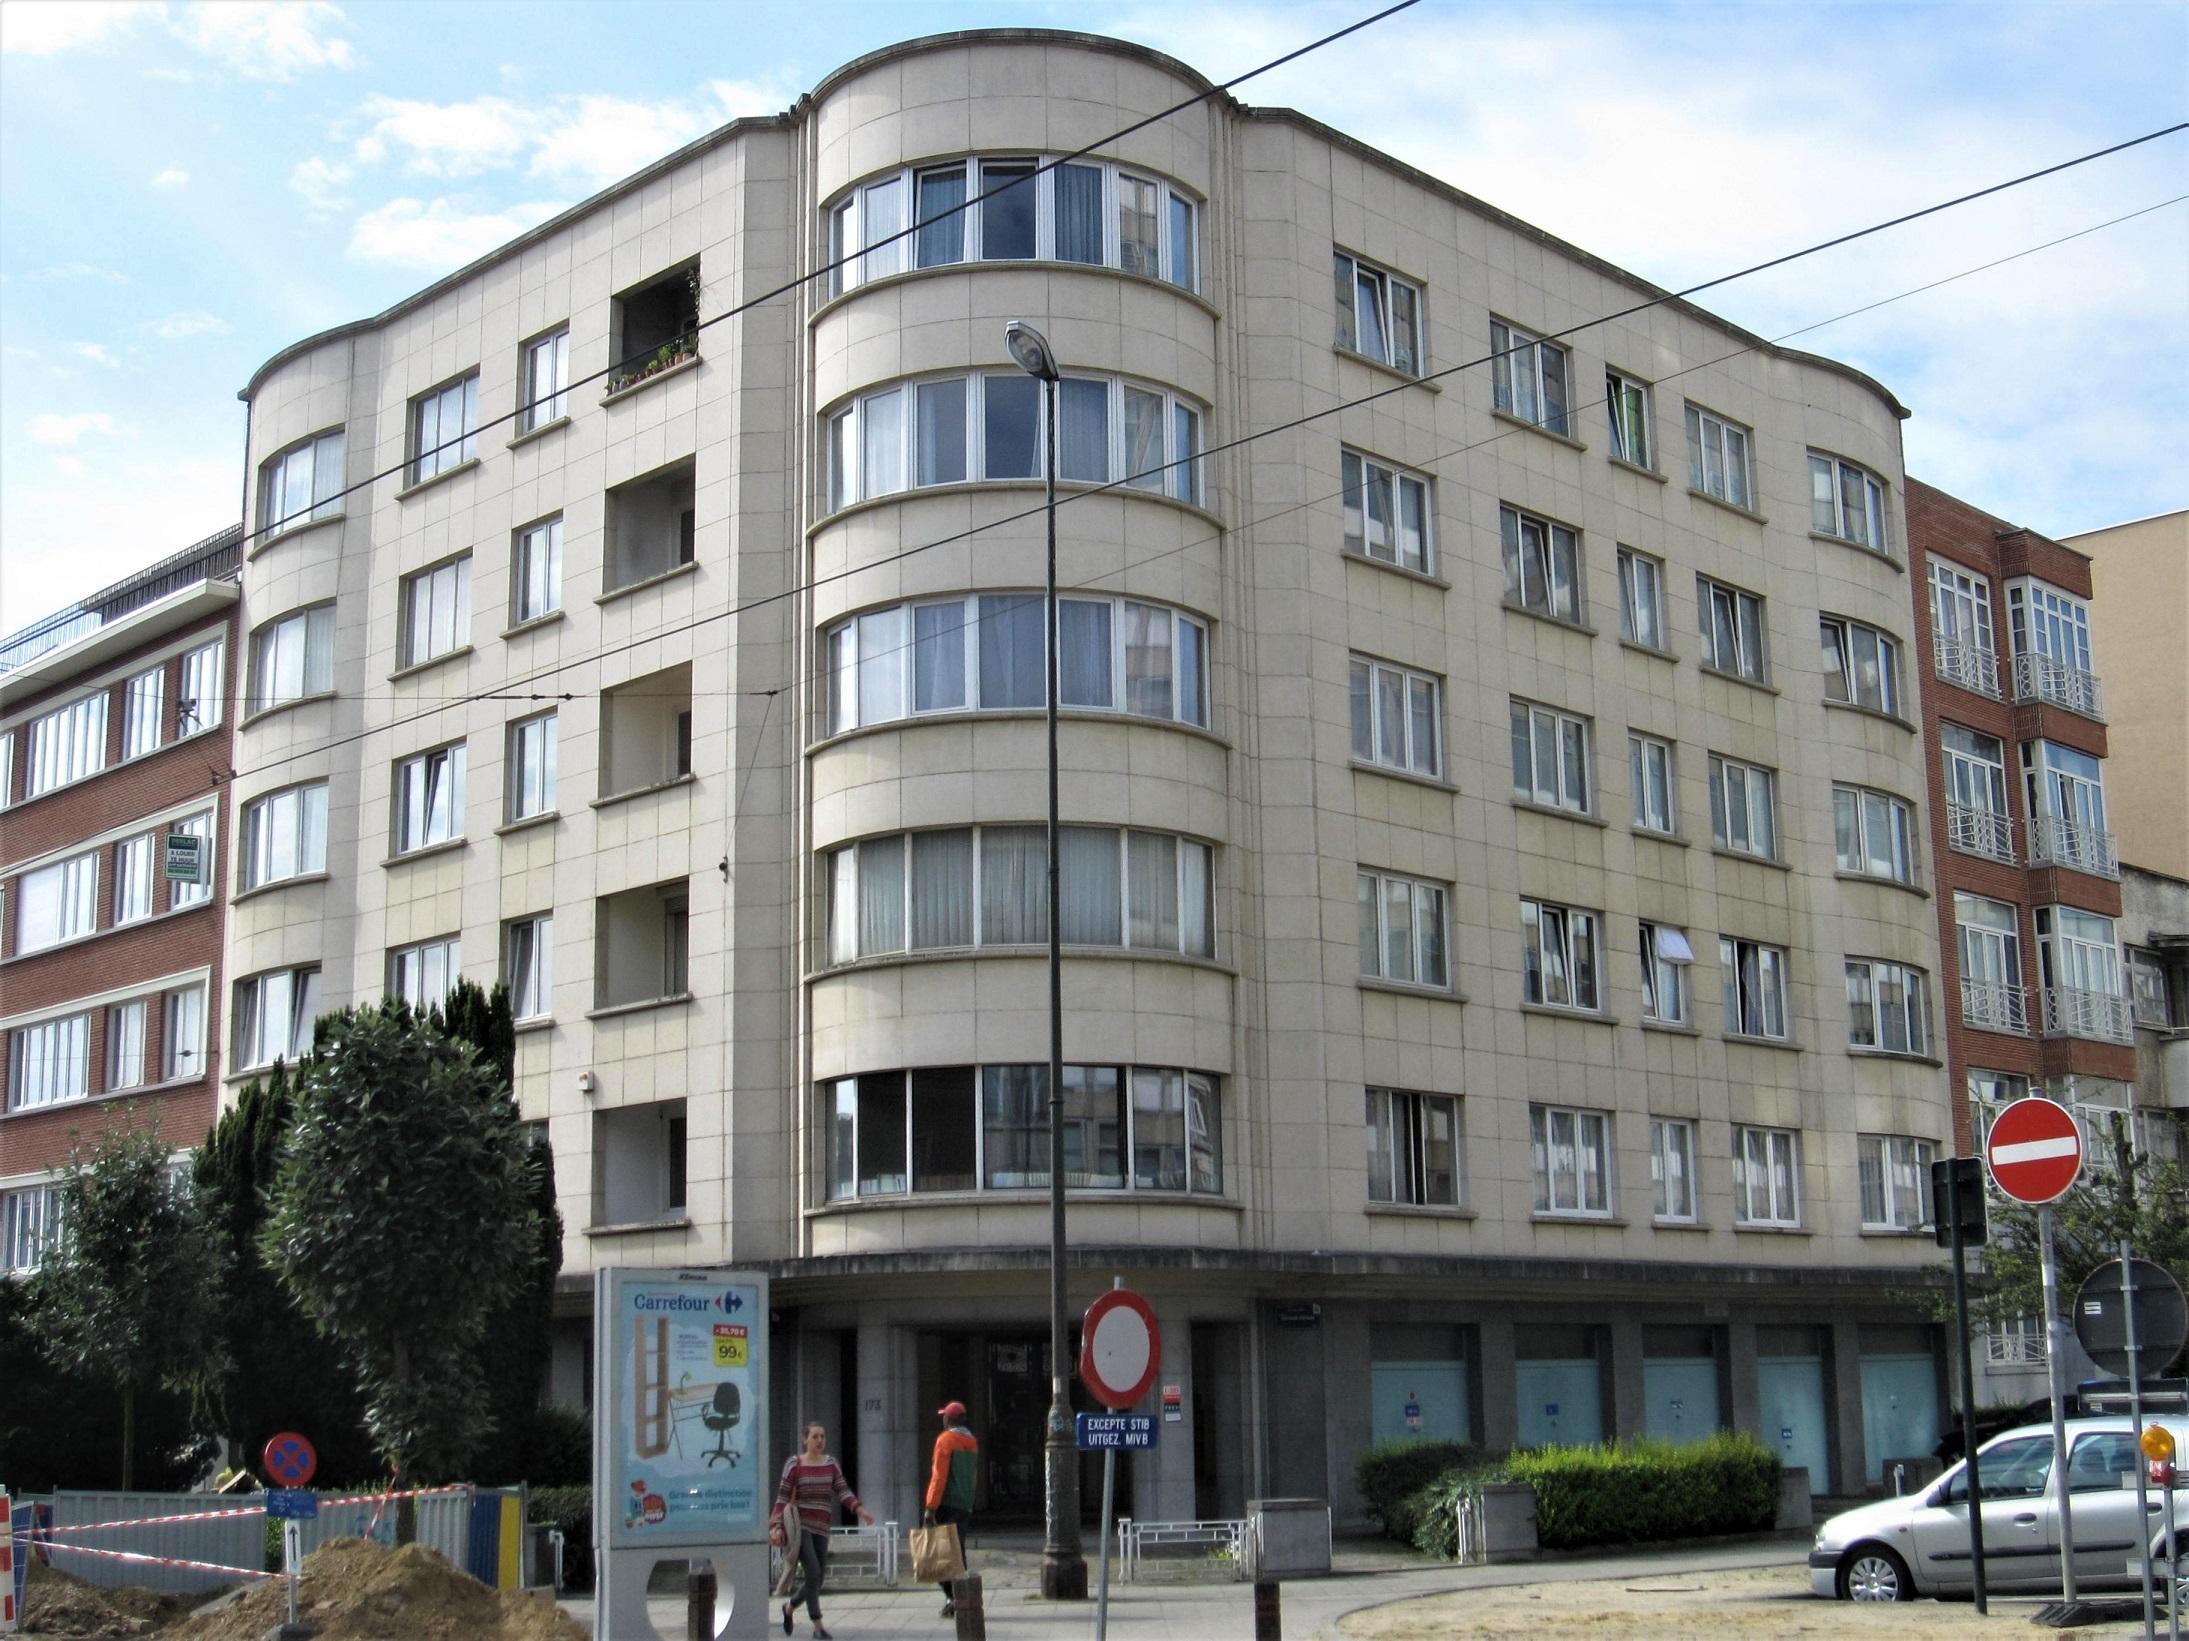 Avenue Adolphe Buyl 173, Résidence Athena, 2013